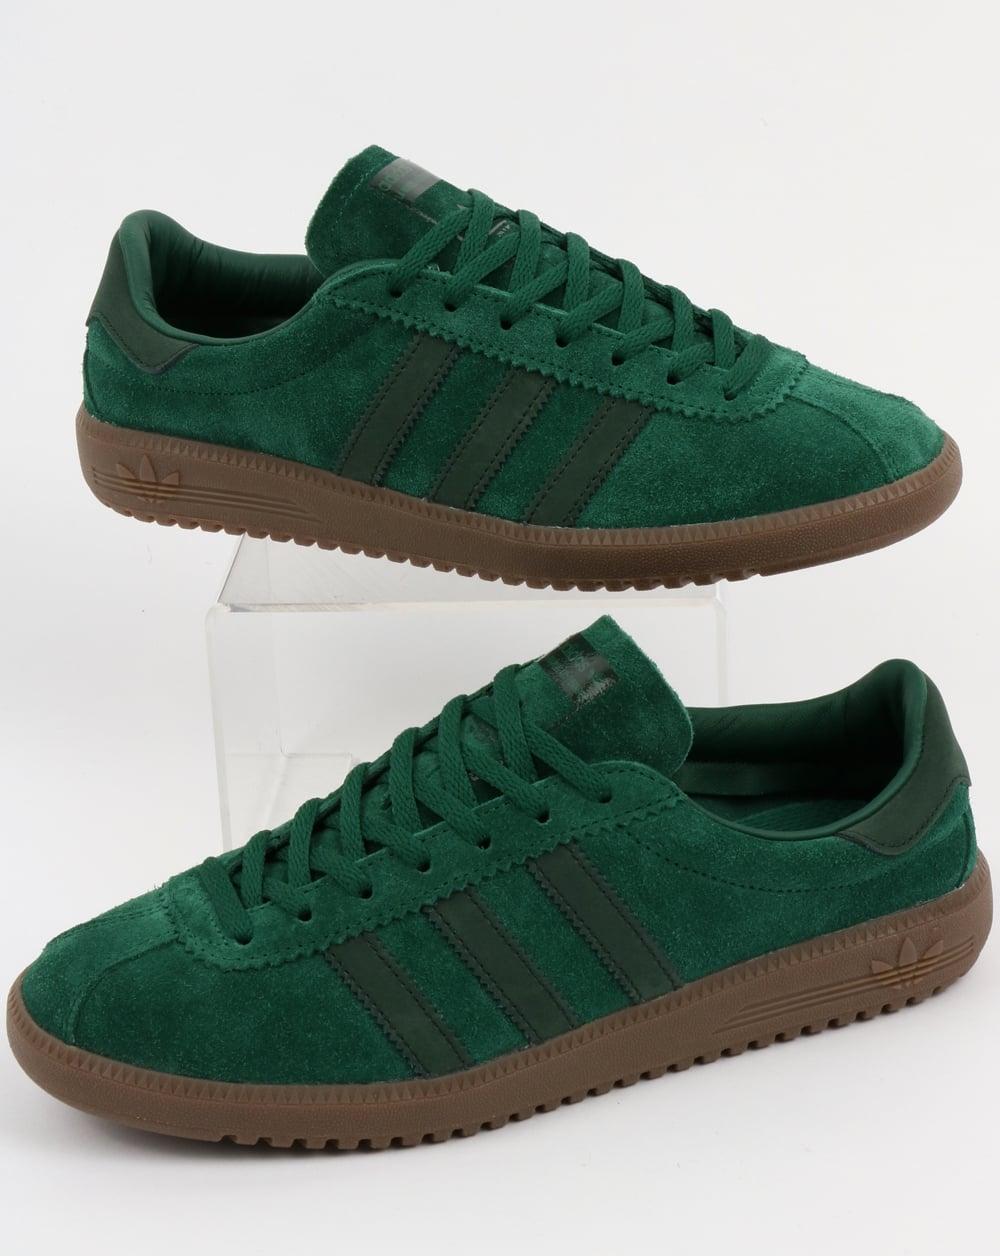 Adidas Bermuda Trainers Green/Night/Gum